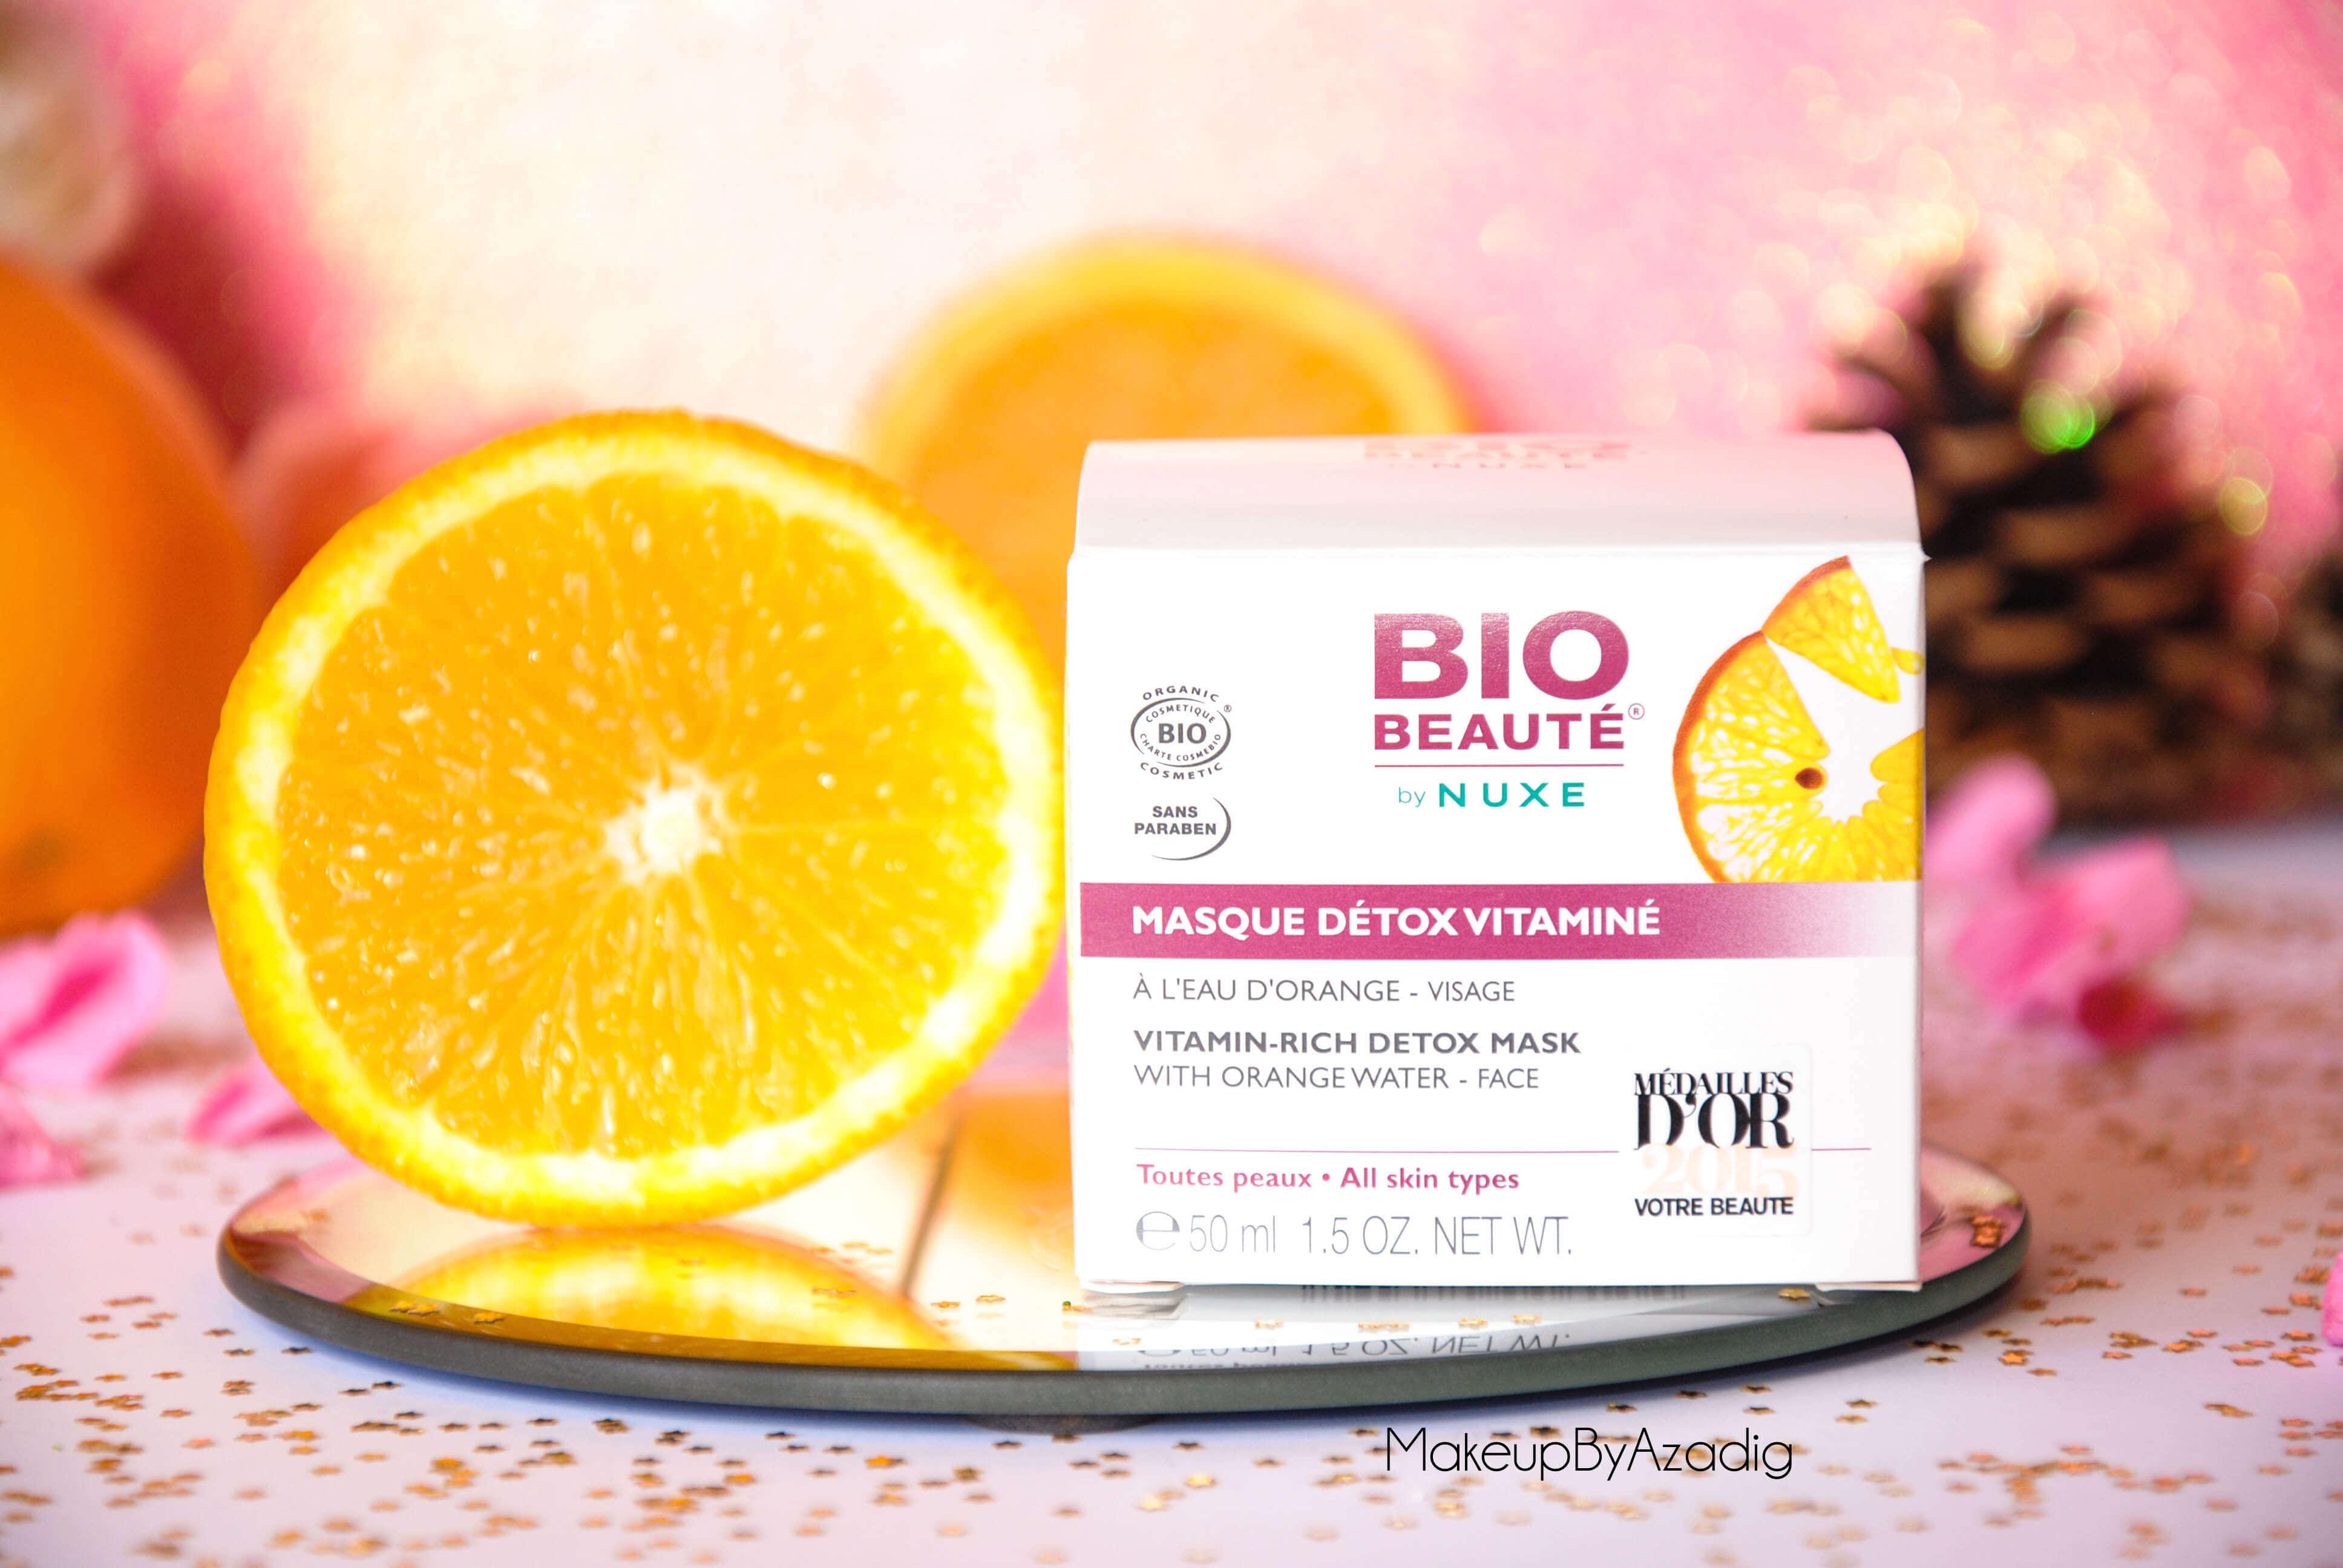 masque-detox-vitamine-bio-beaute-nuxe-makeupbyazadig-pas-cher-avis-revue-doctipharma-troyes-medaille-dor-beaute